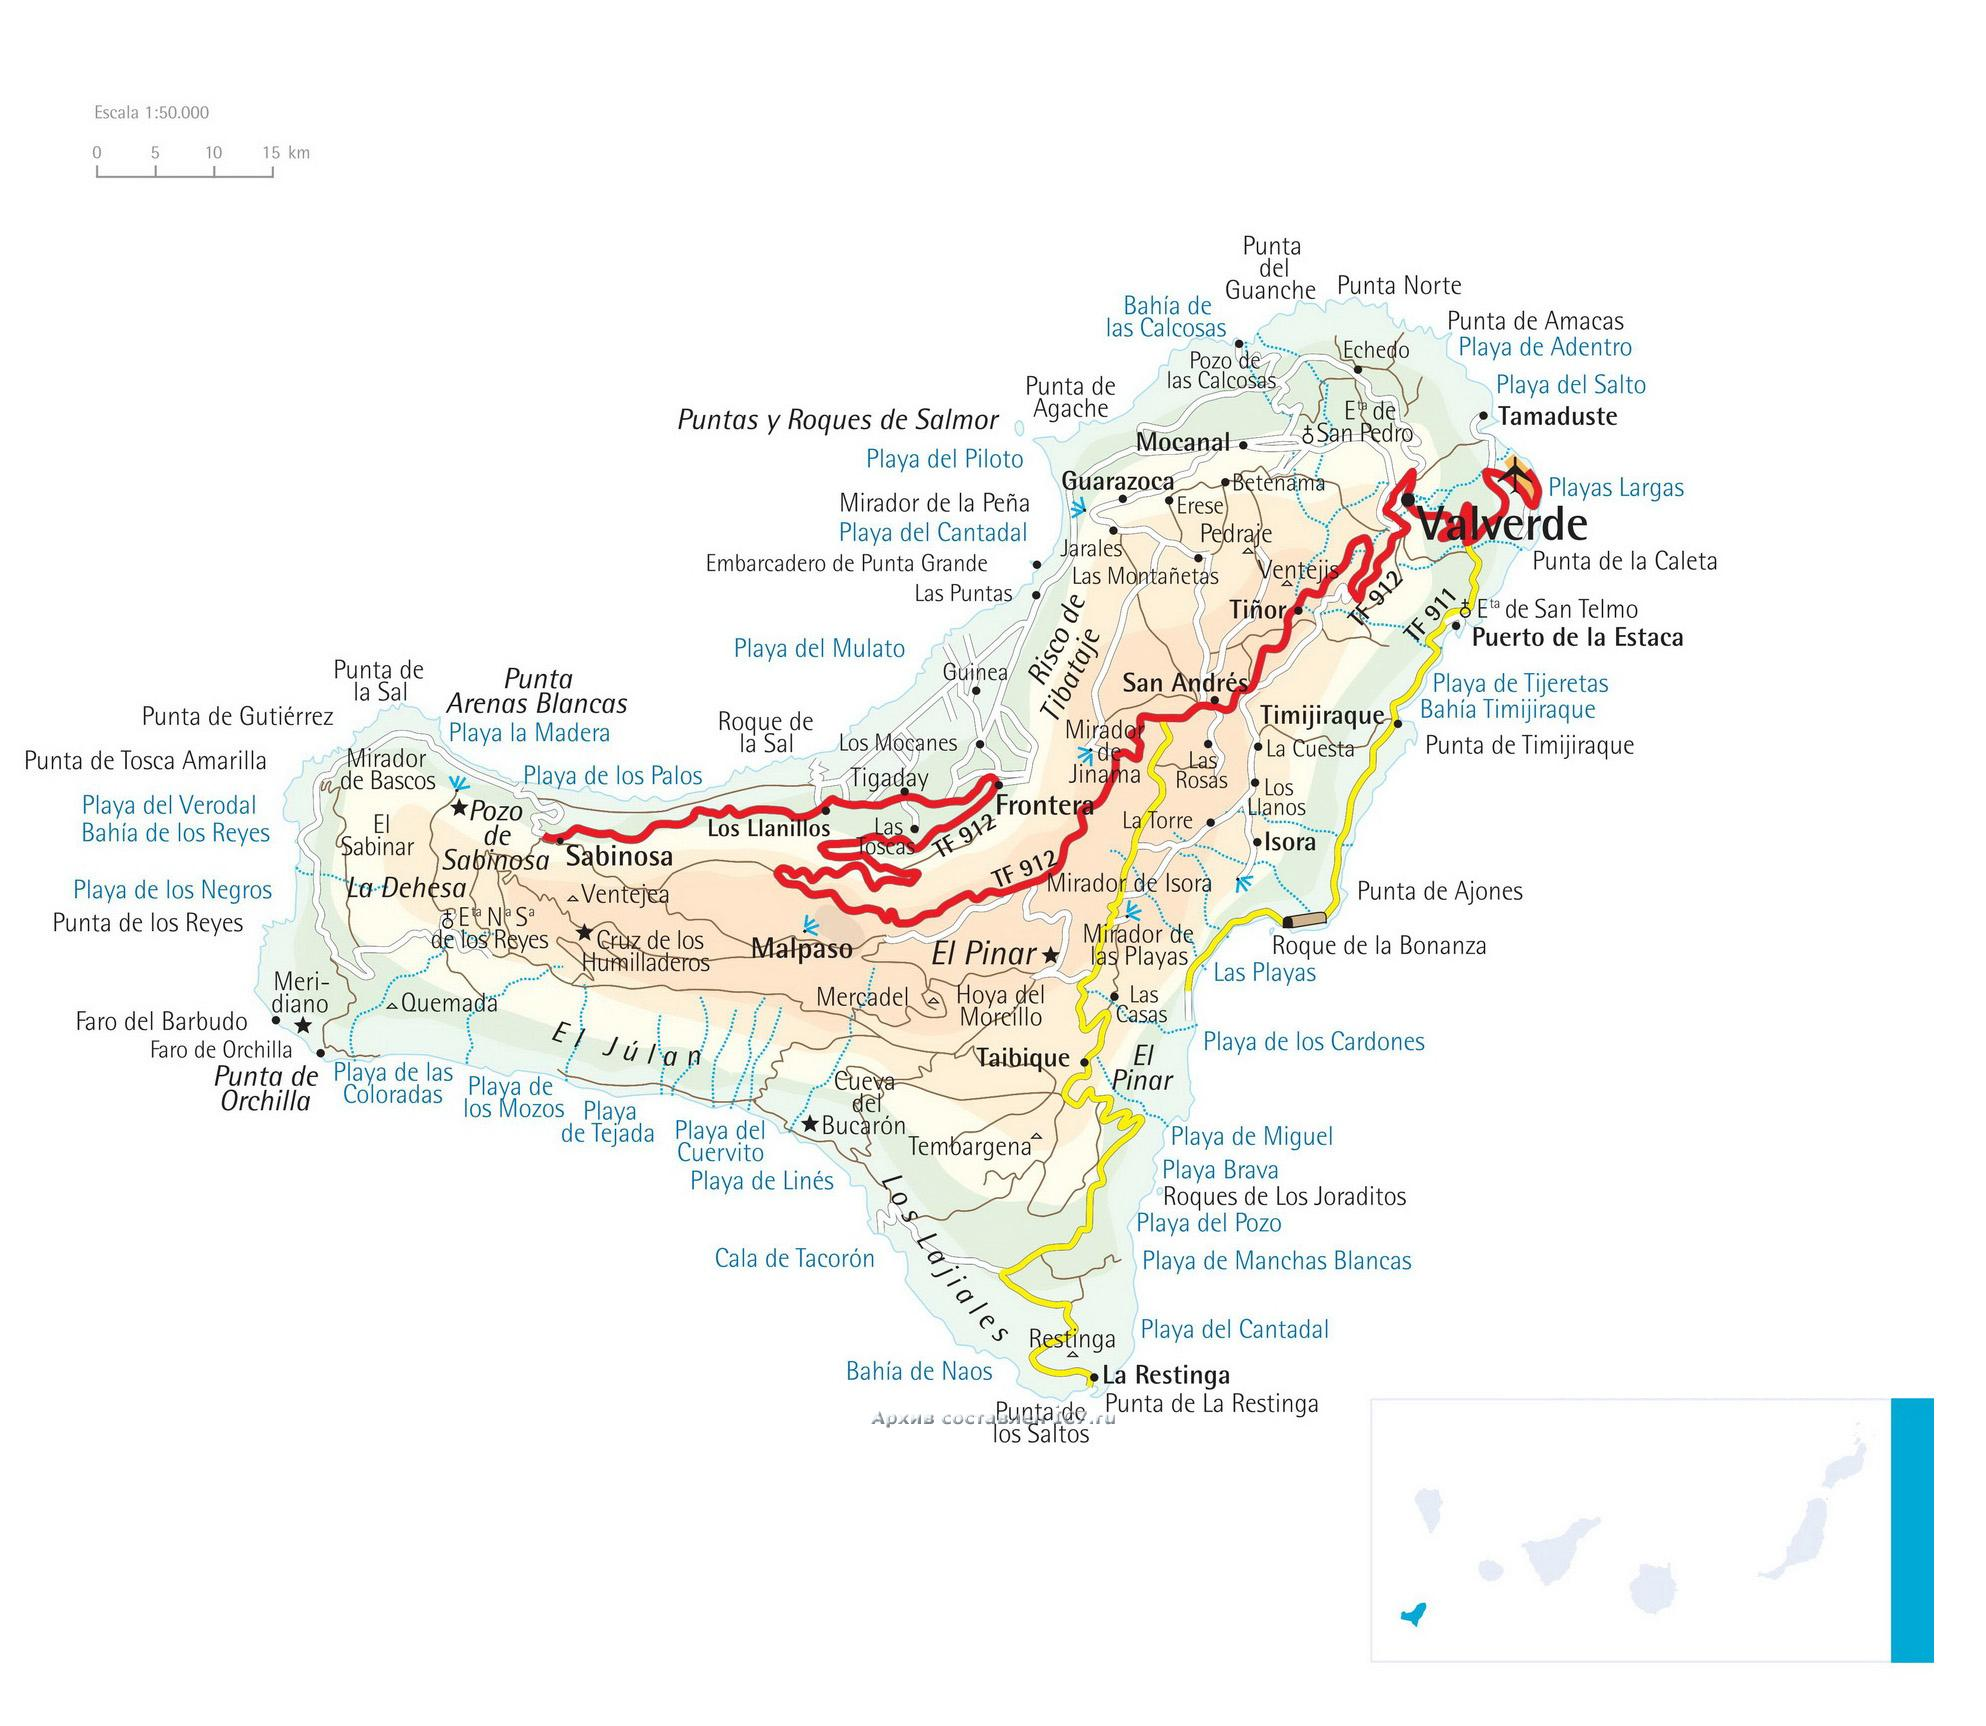 Подробная карта острова Эль Йерро